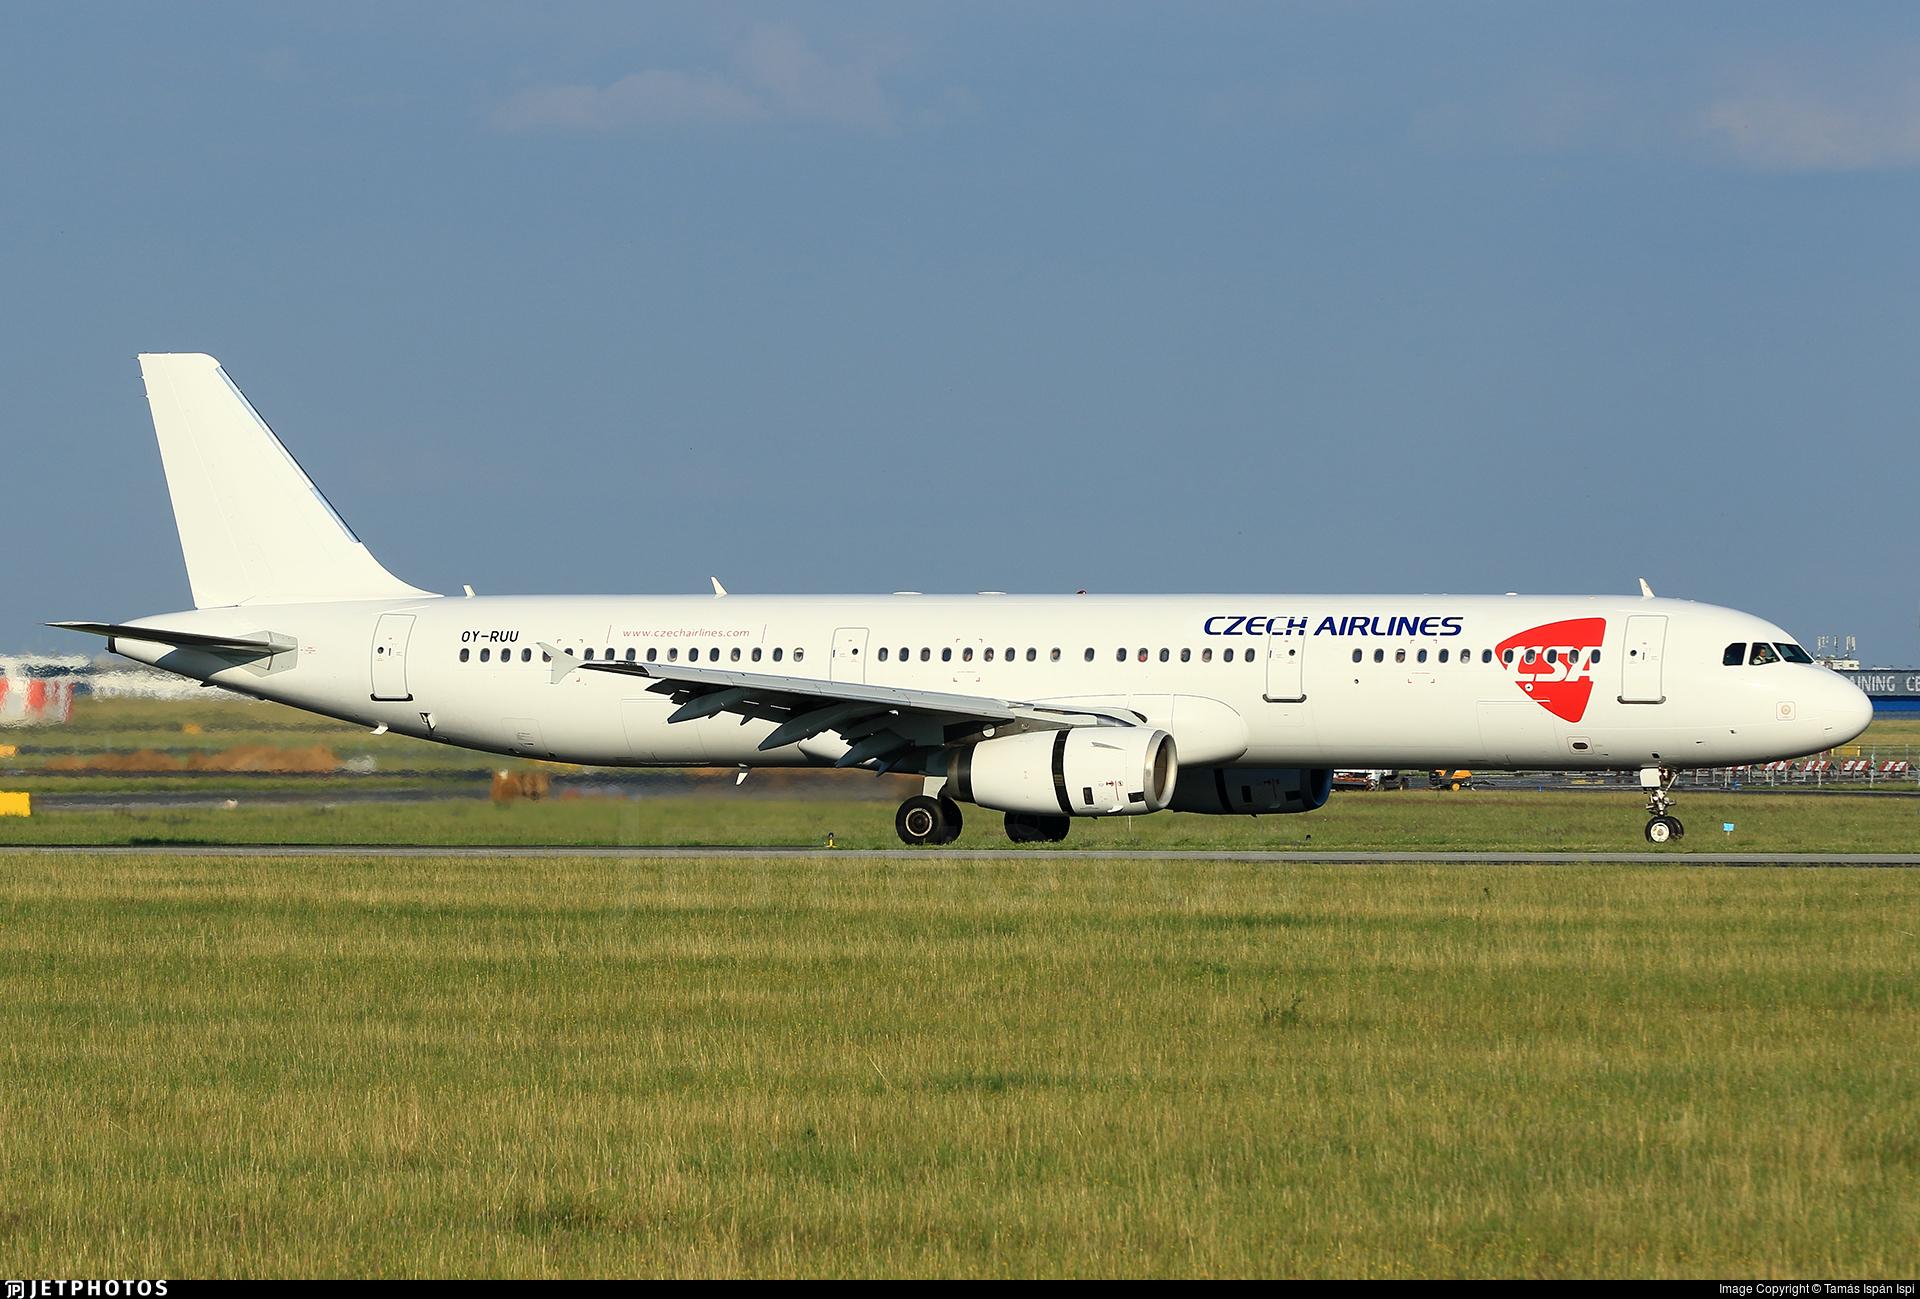 OY-RUU - Airbus A321-231 - CSA Czech Airlines (Danish Air Transport - DAT)